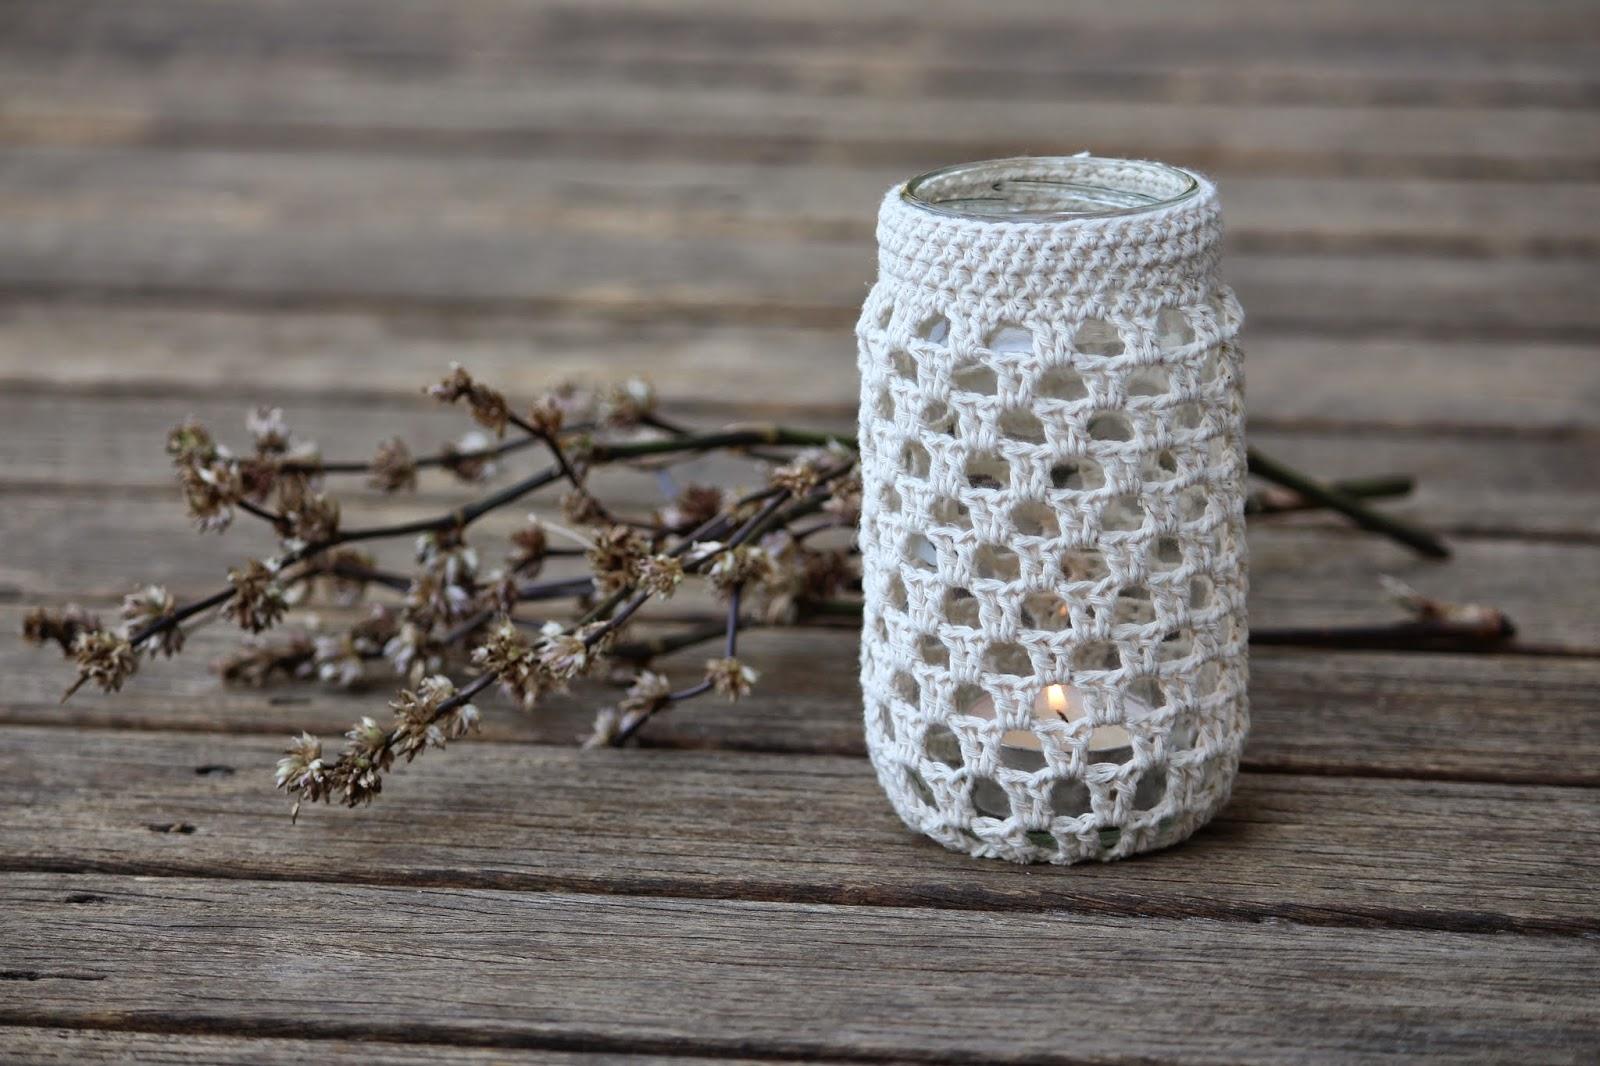 Edward And Lilly Crochet Jar Cosy Pattern